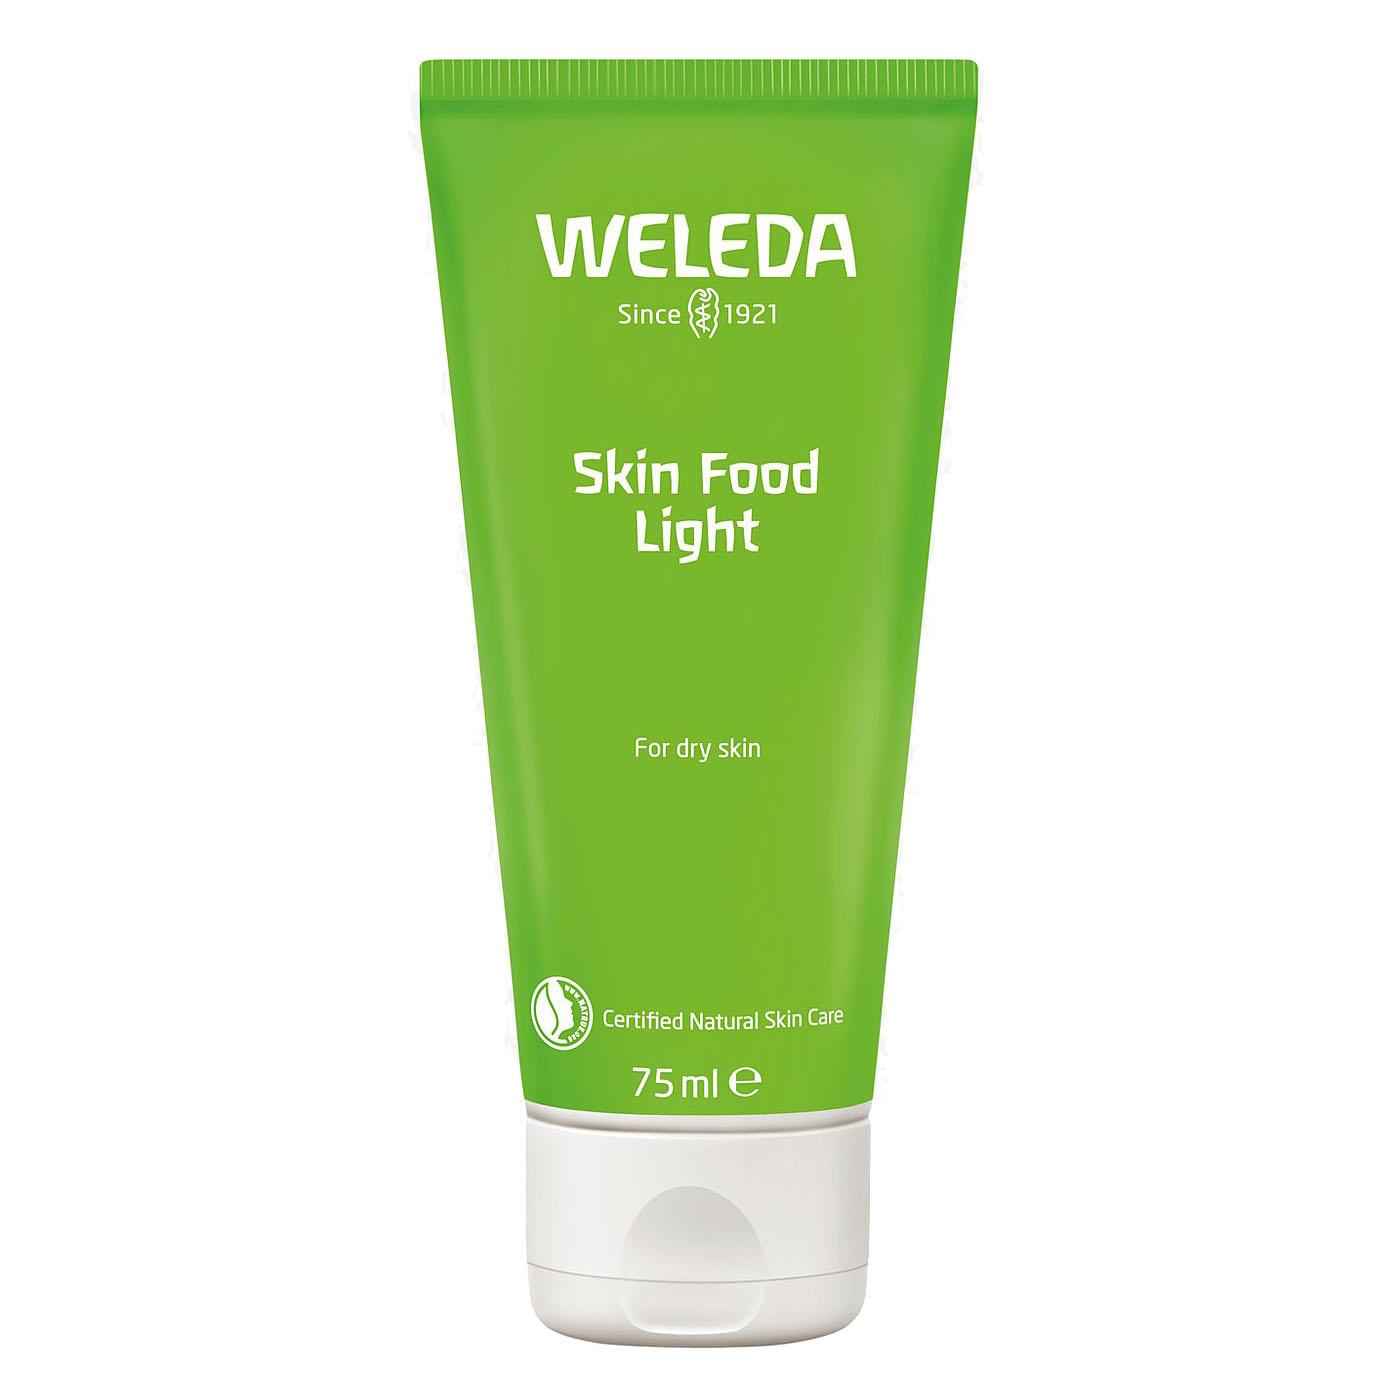 Weleda skin food light 75 ml